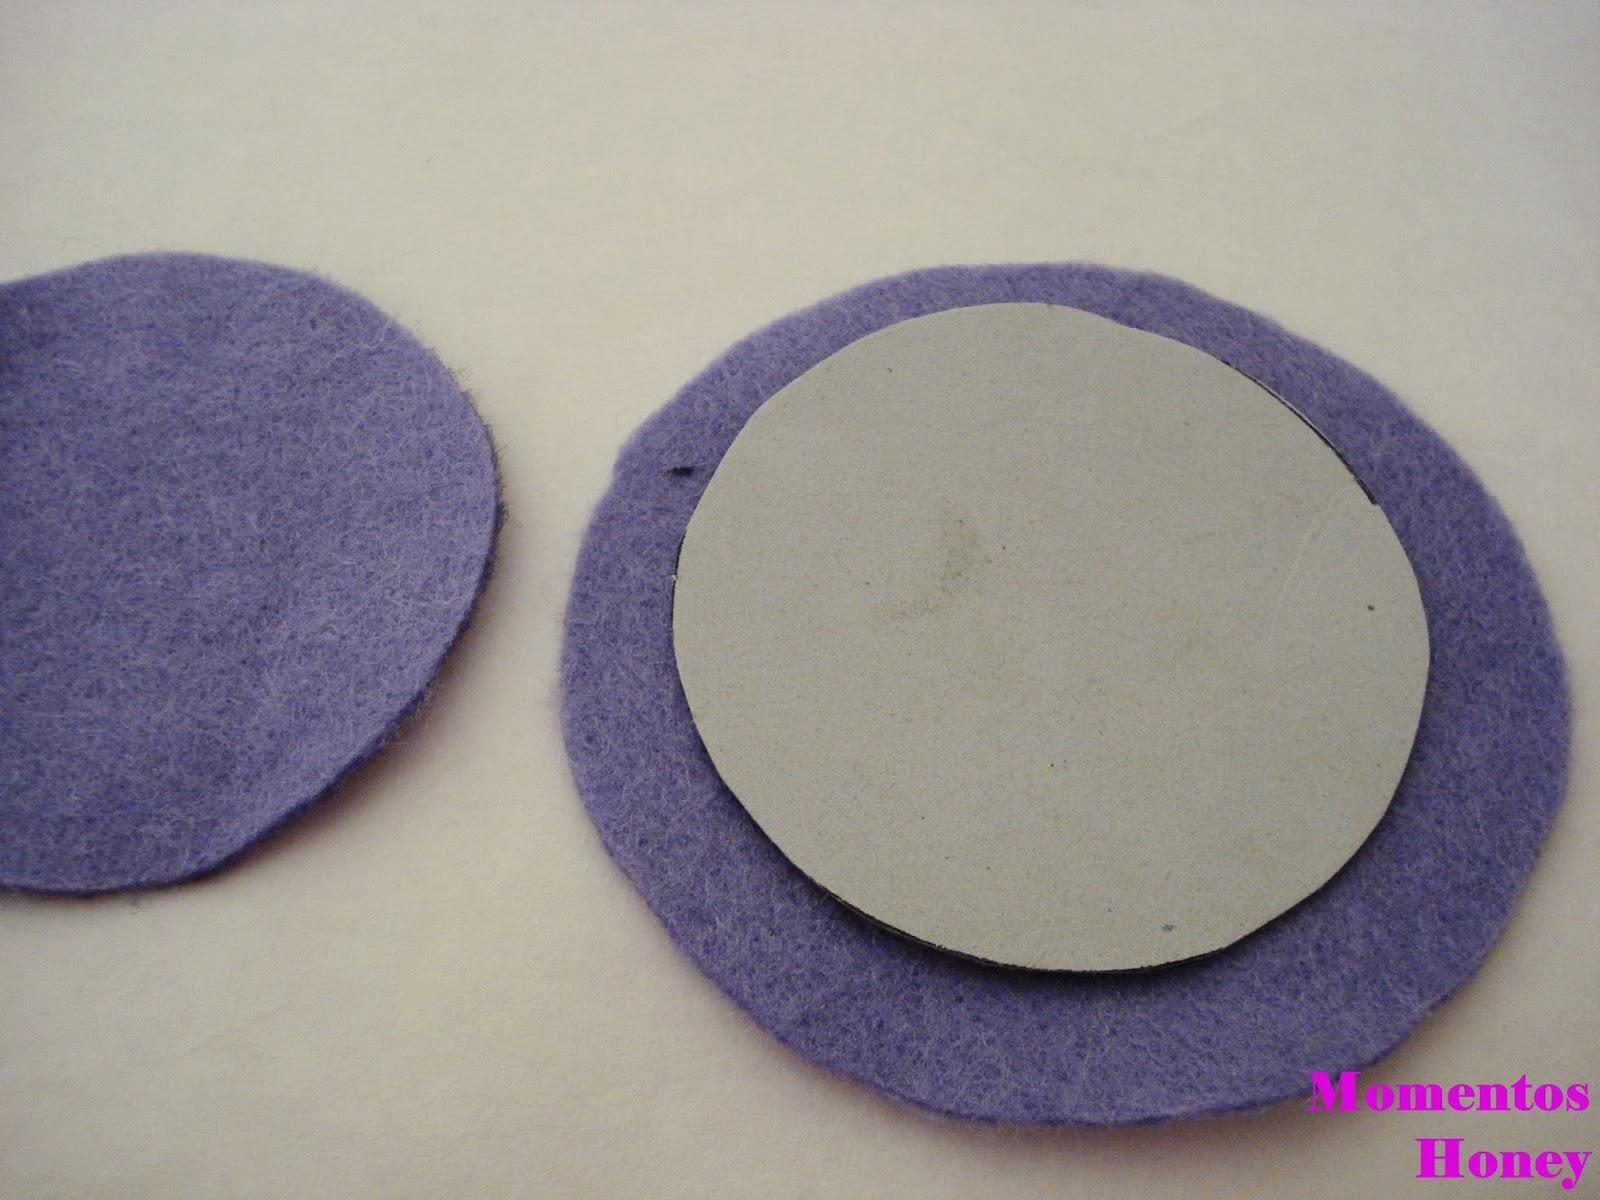 Momentos Honey: Dalia violeta realizada en fieltro